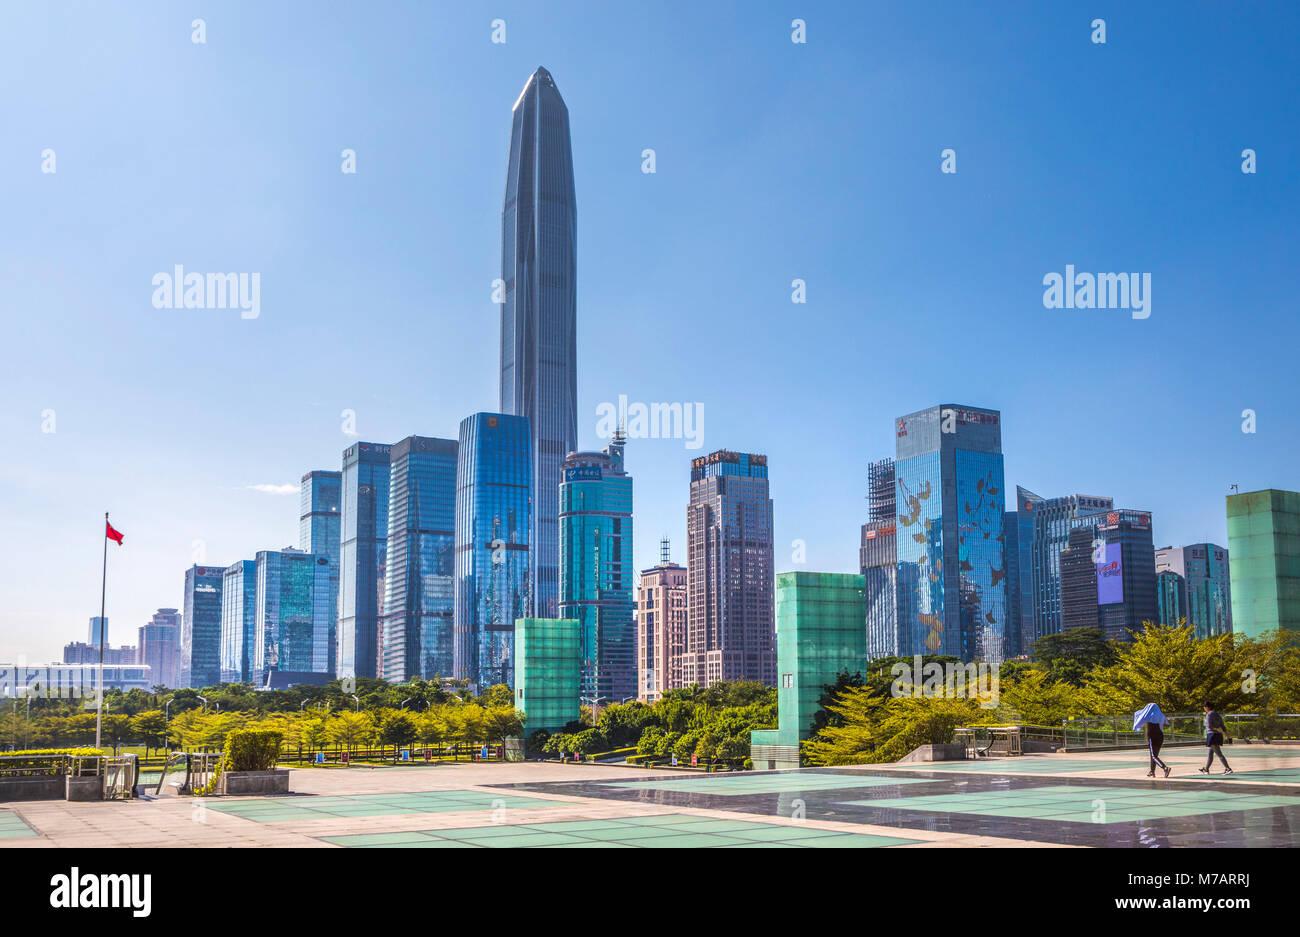 China, Shenzhen City, Shenzhen Pingan  Tower, Futian District - Stock Image